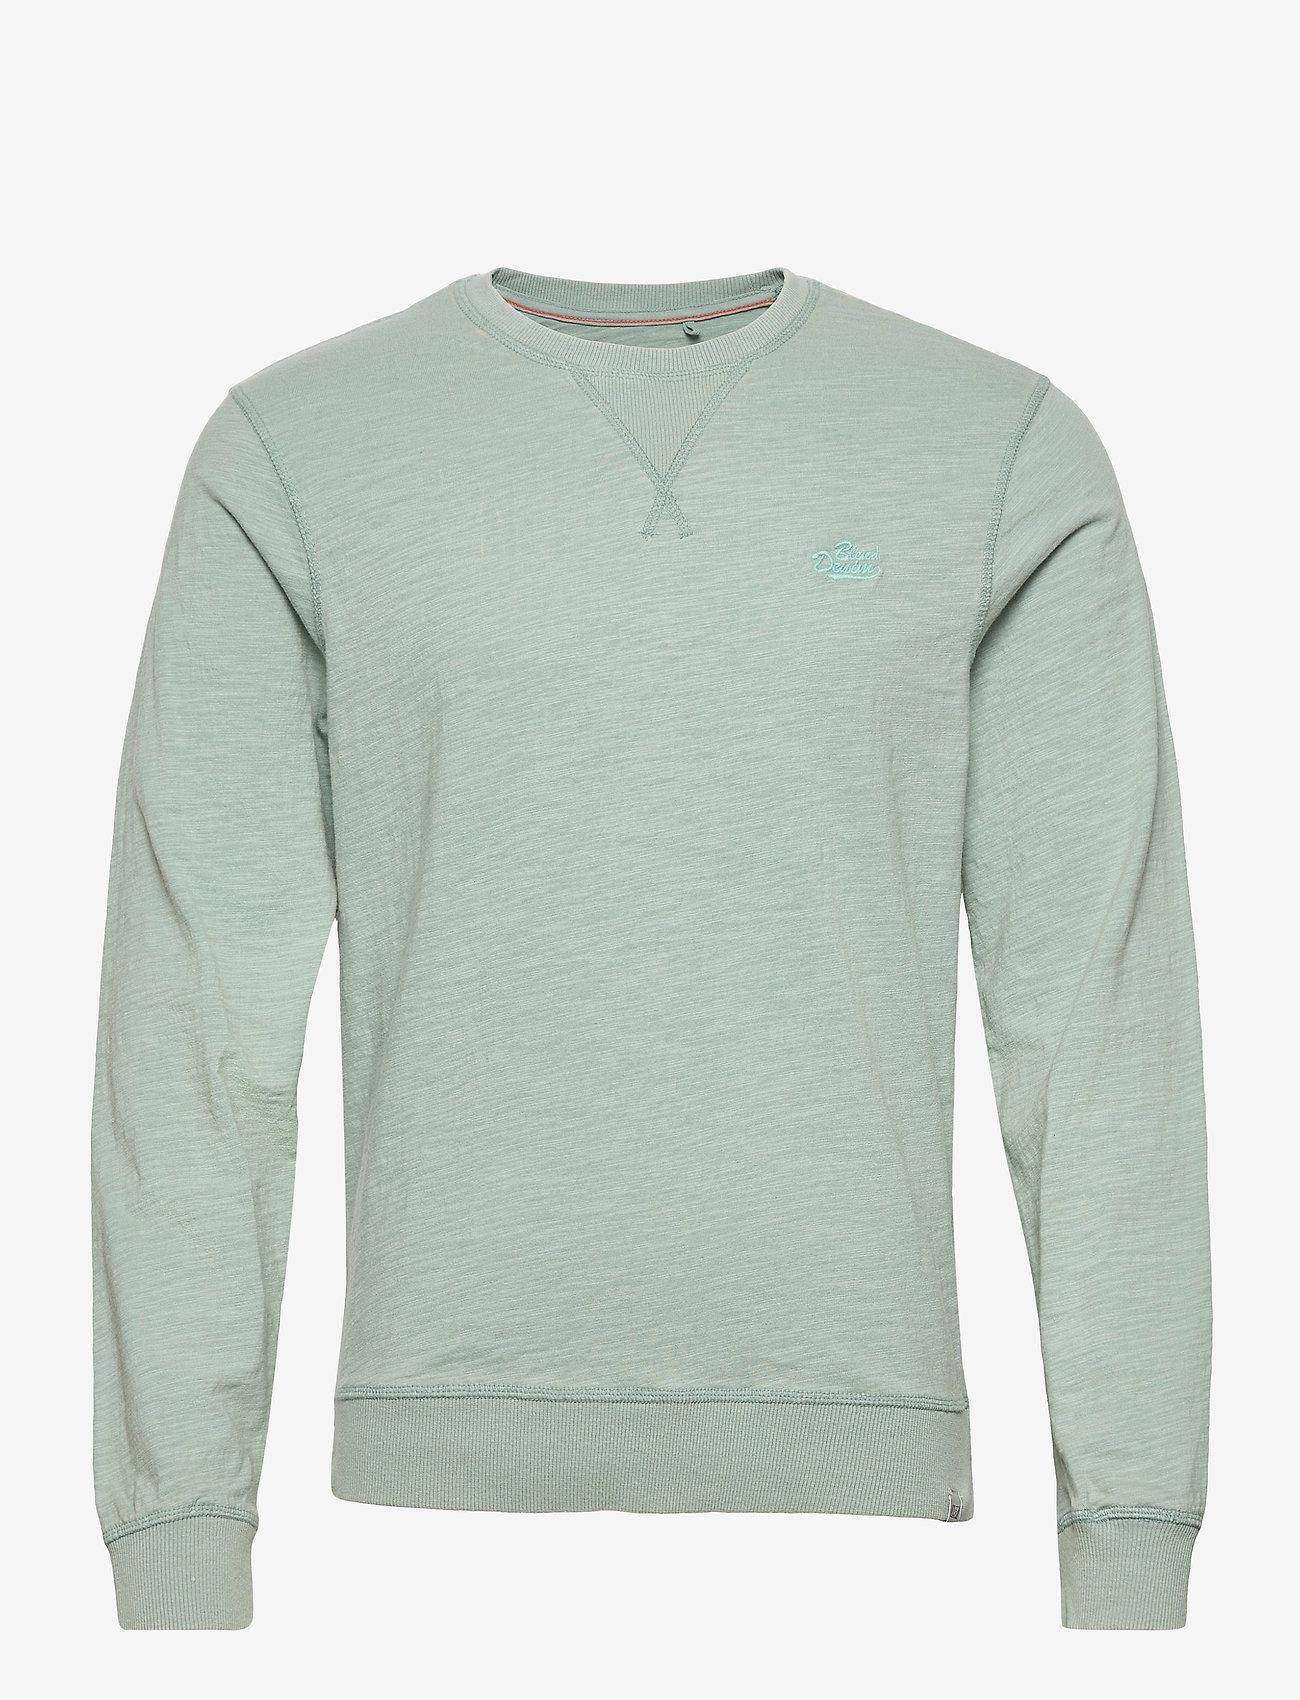 Blend - Sweatshirt - basic sweatshirts - aquifer - 0